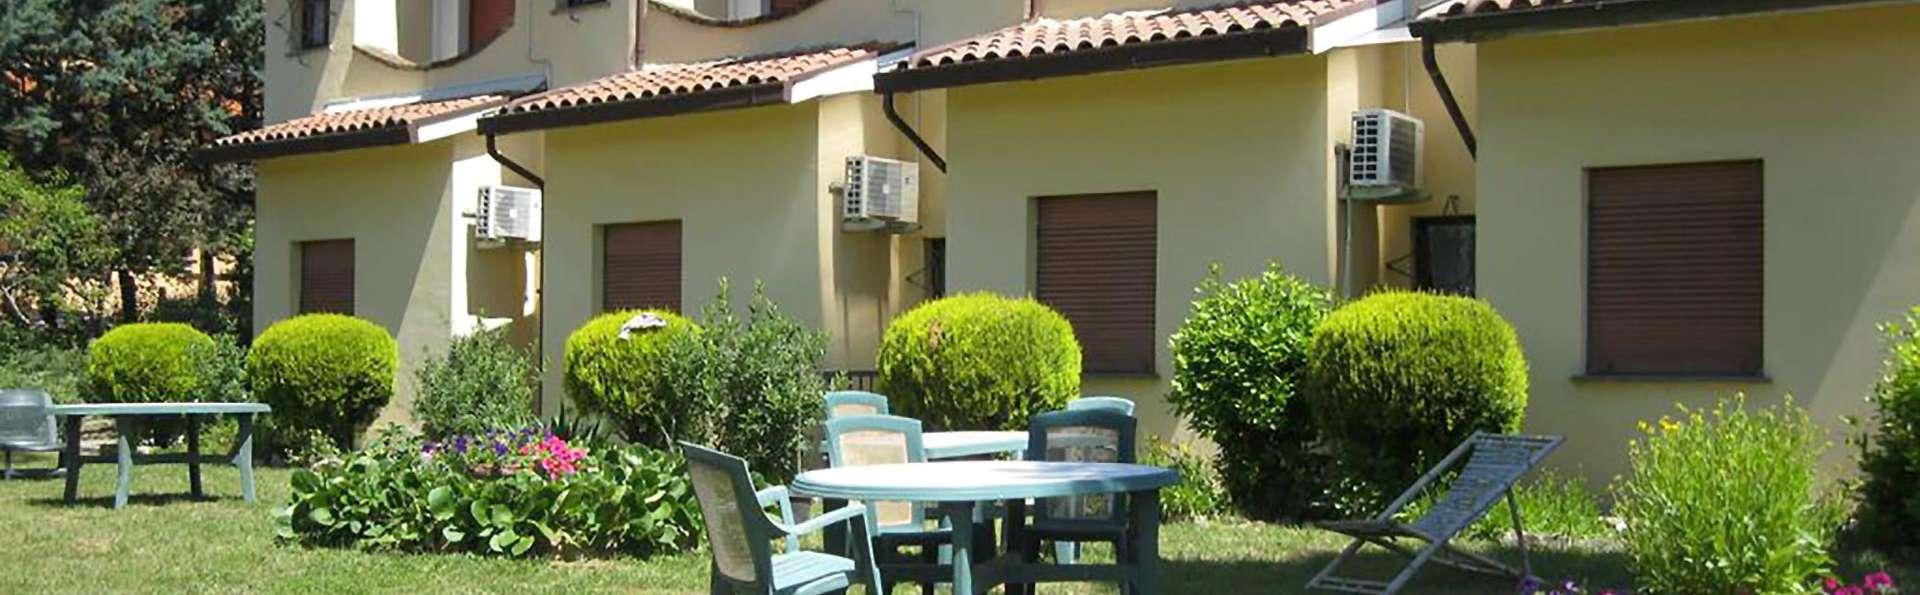 Hotel Rosati - Edit_Garden.jpg